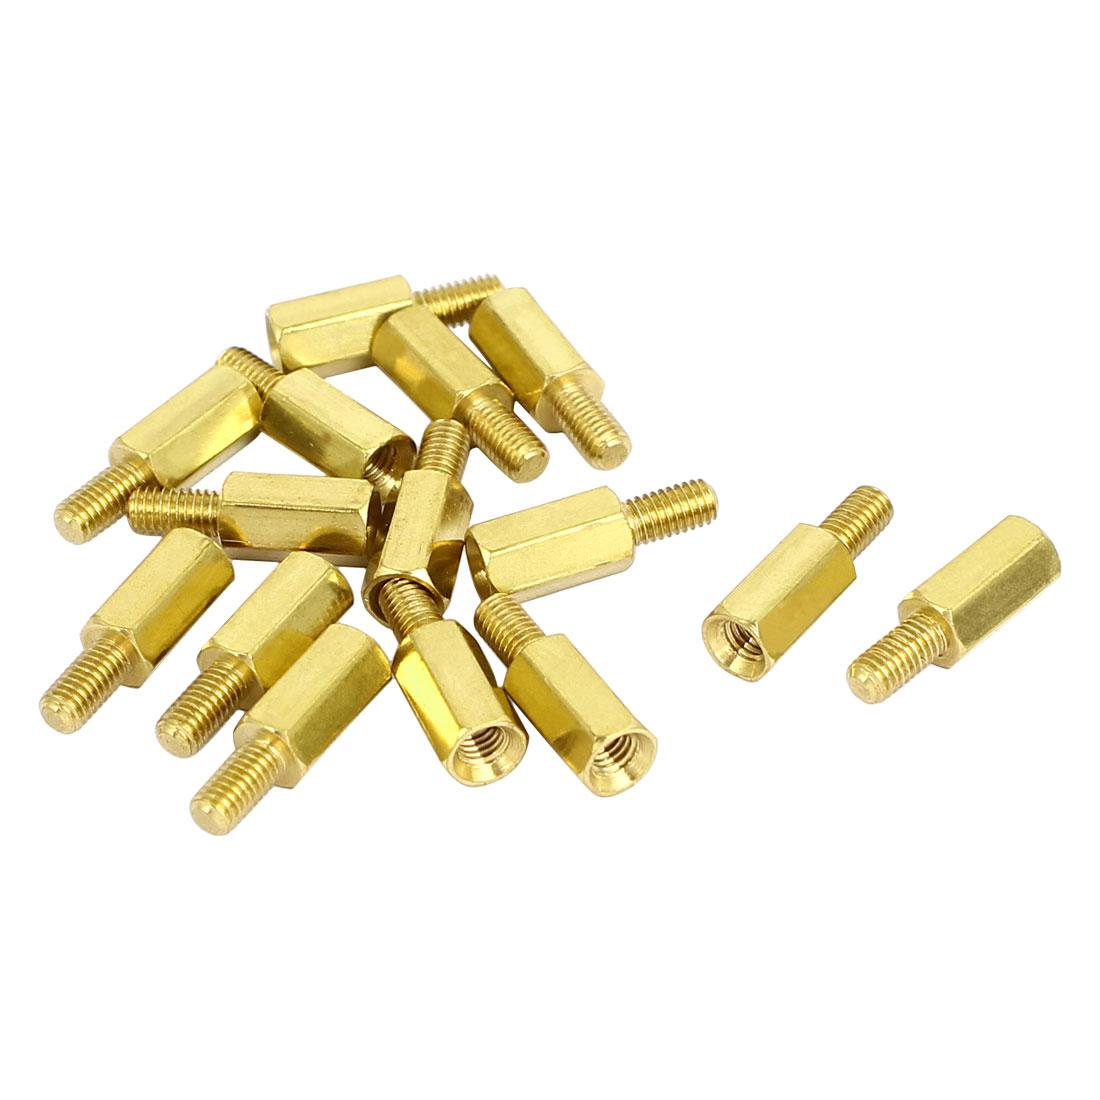 M3x9mm+6mm Male to Female Threaded Brass Hex Hexagonal Standoff Spacer Pillar 15pcs